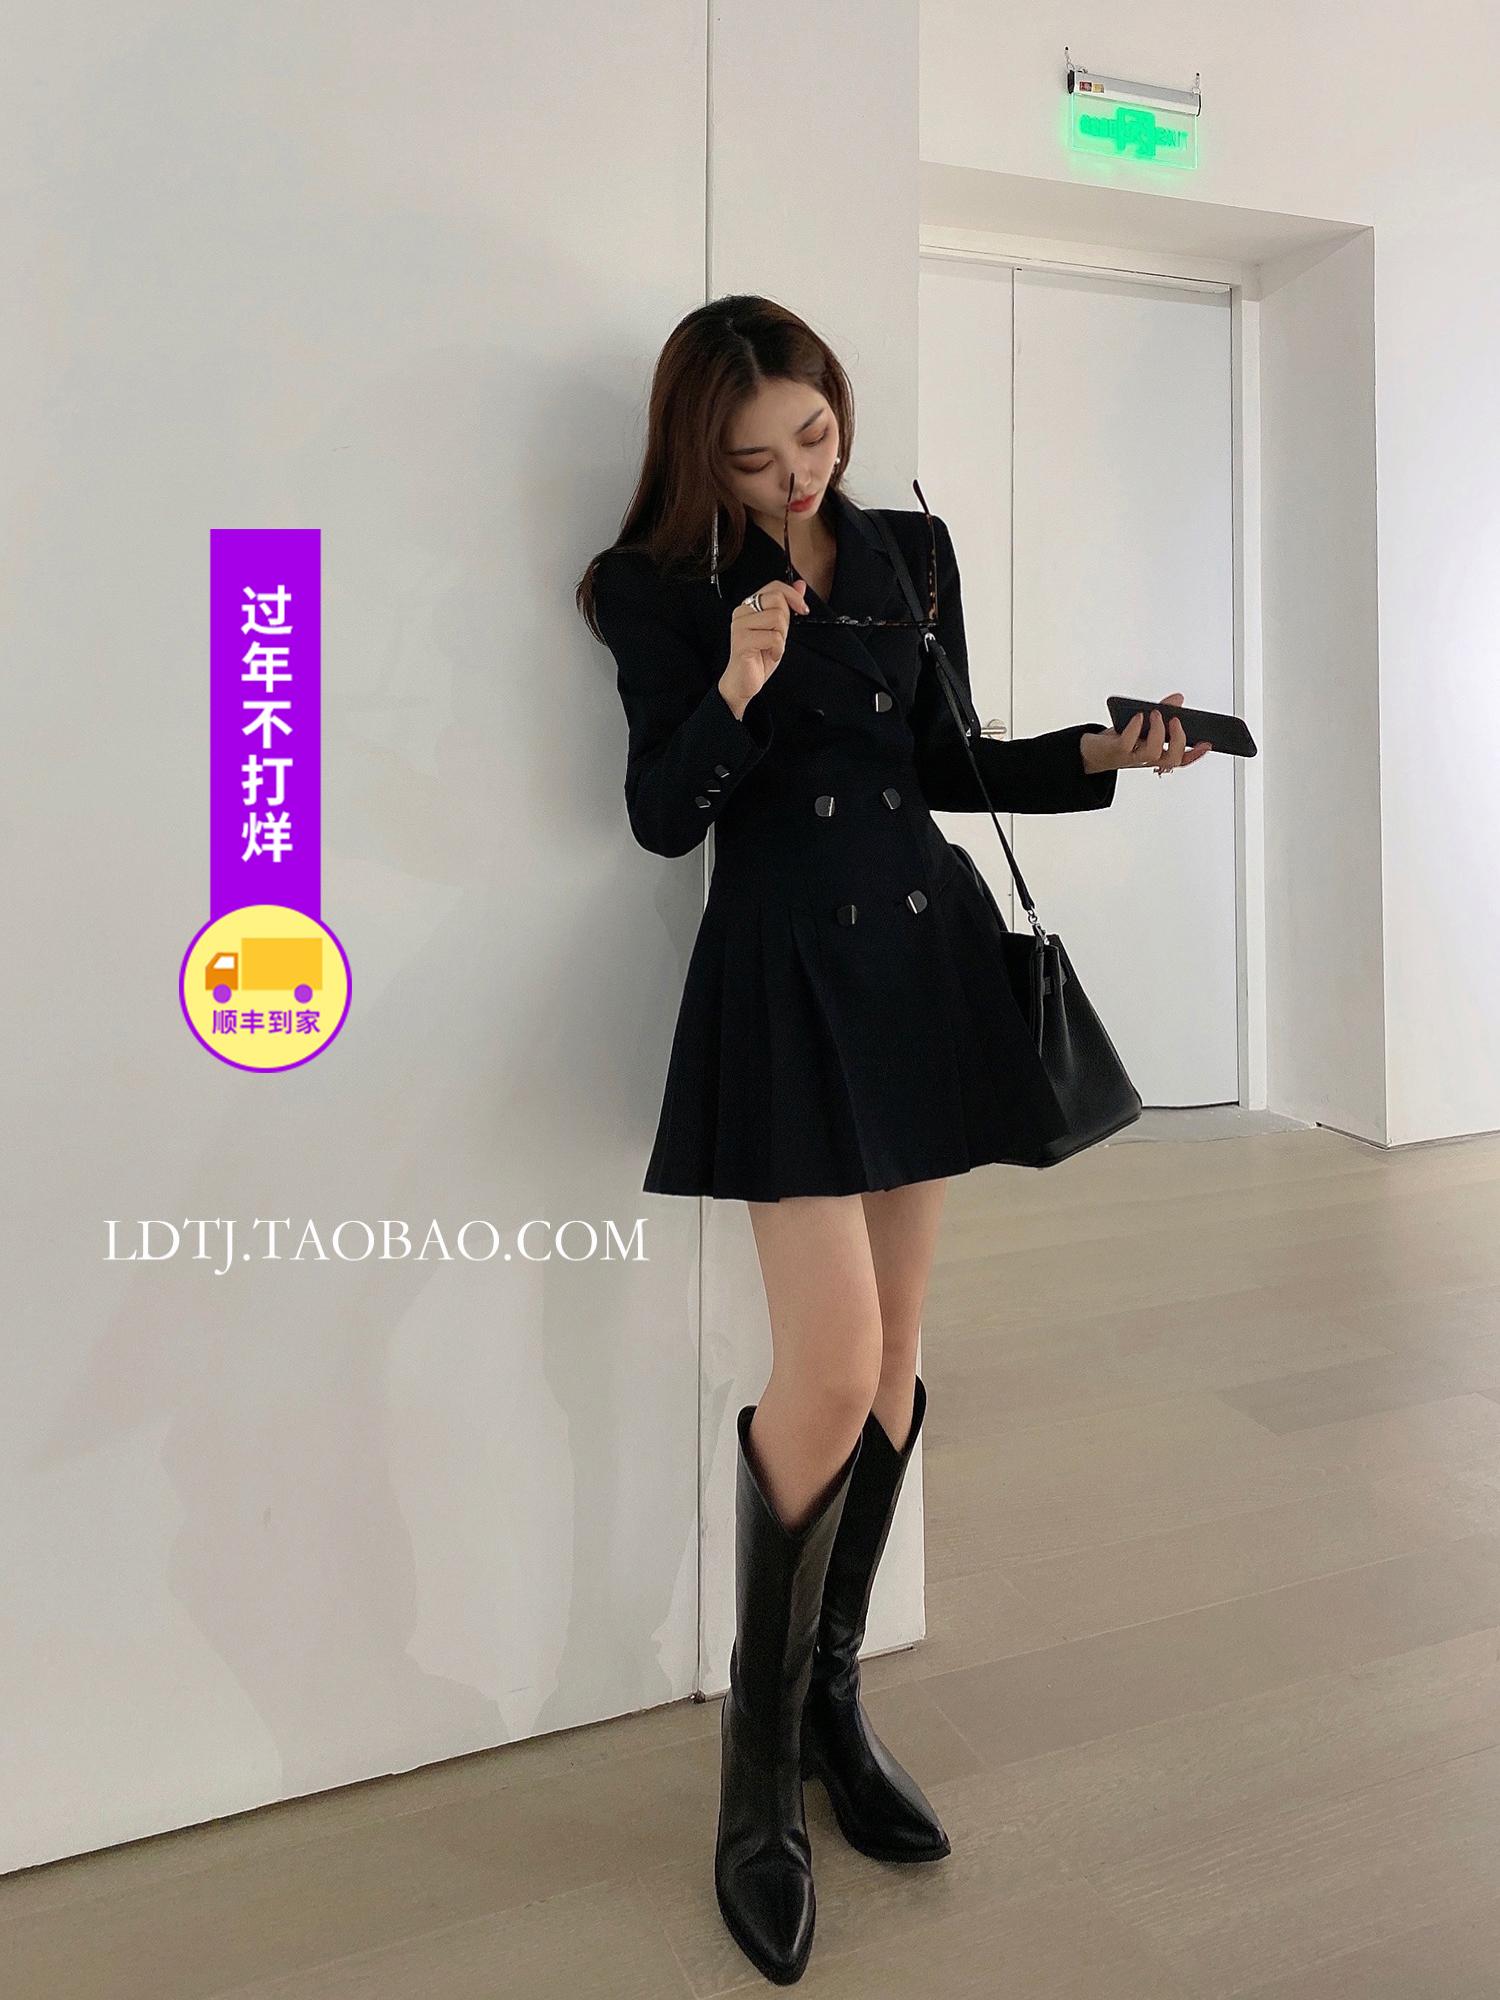 LDTJ Xu Ruichi Gao Wenying show thin pleated suit skirt 2021 spring new black waist dress short girl